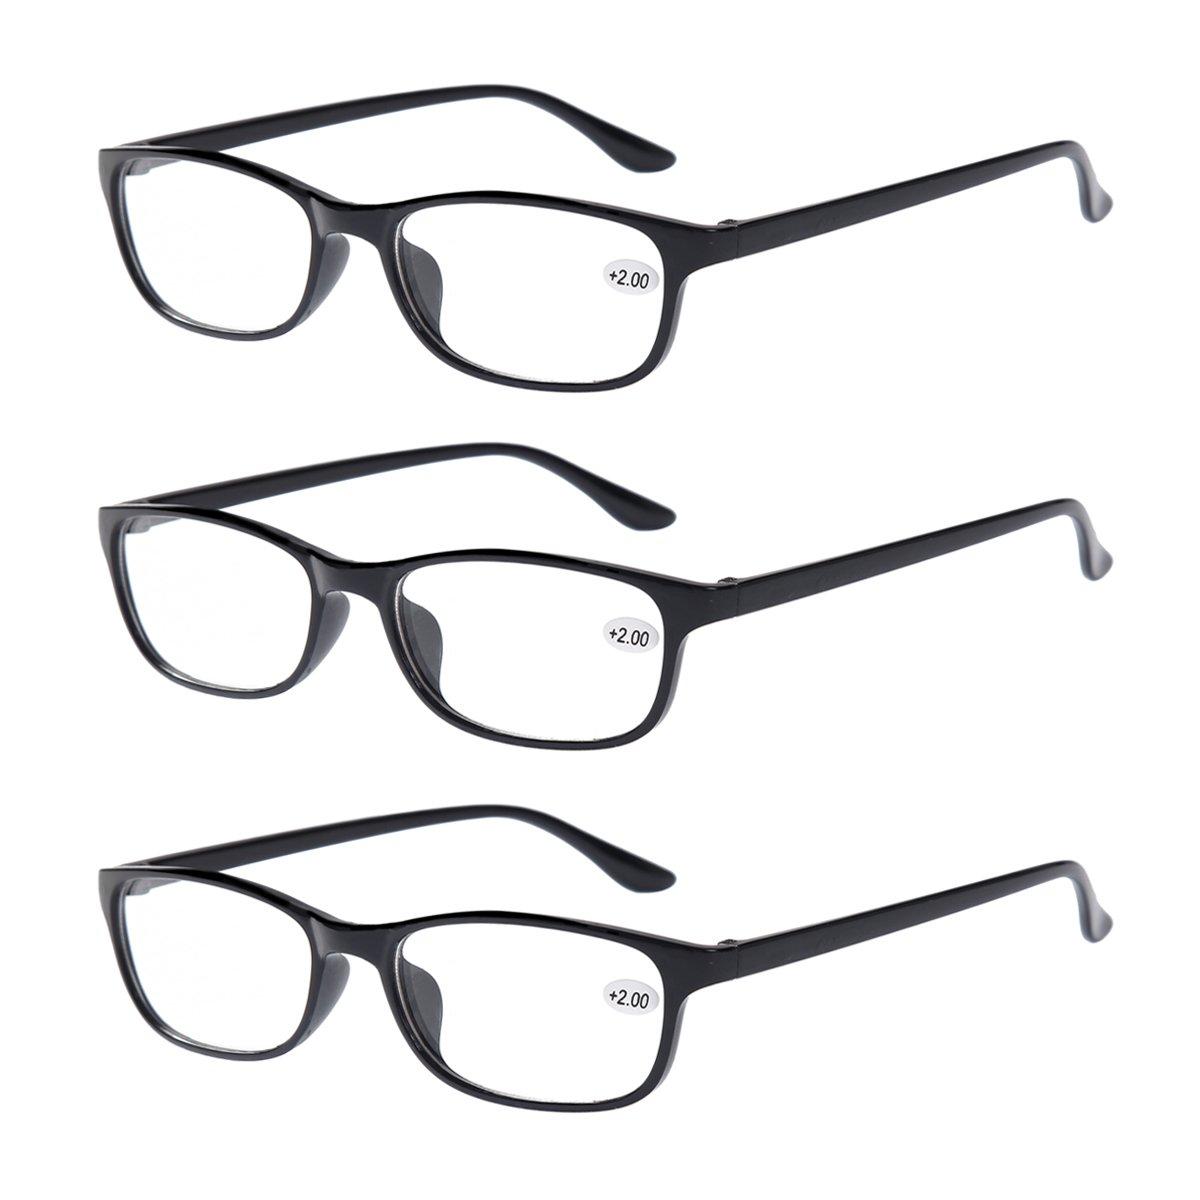 Amazon.com: 3 PRS of Southern Seas +2.50 Bifocals Reading